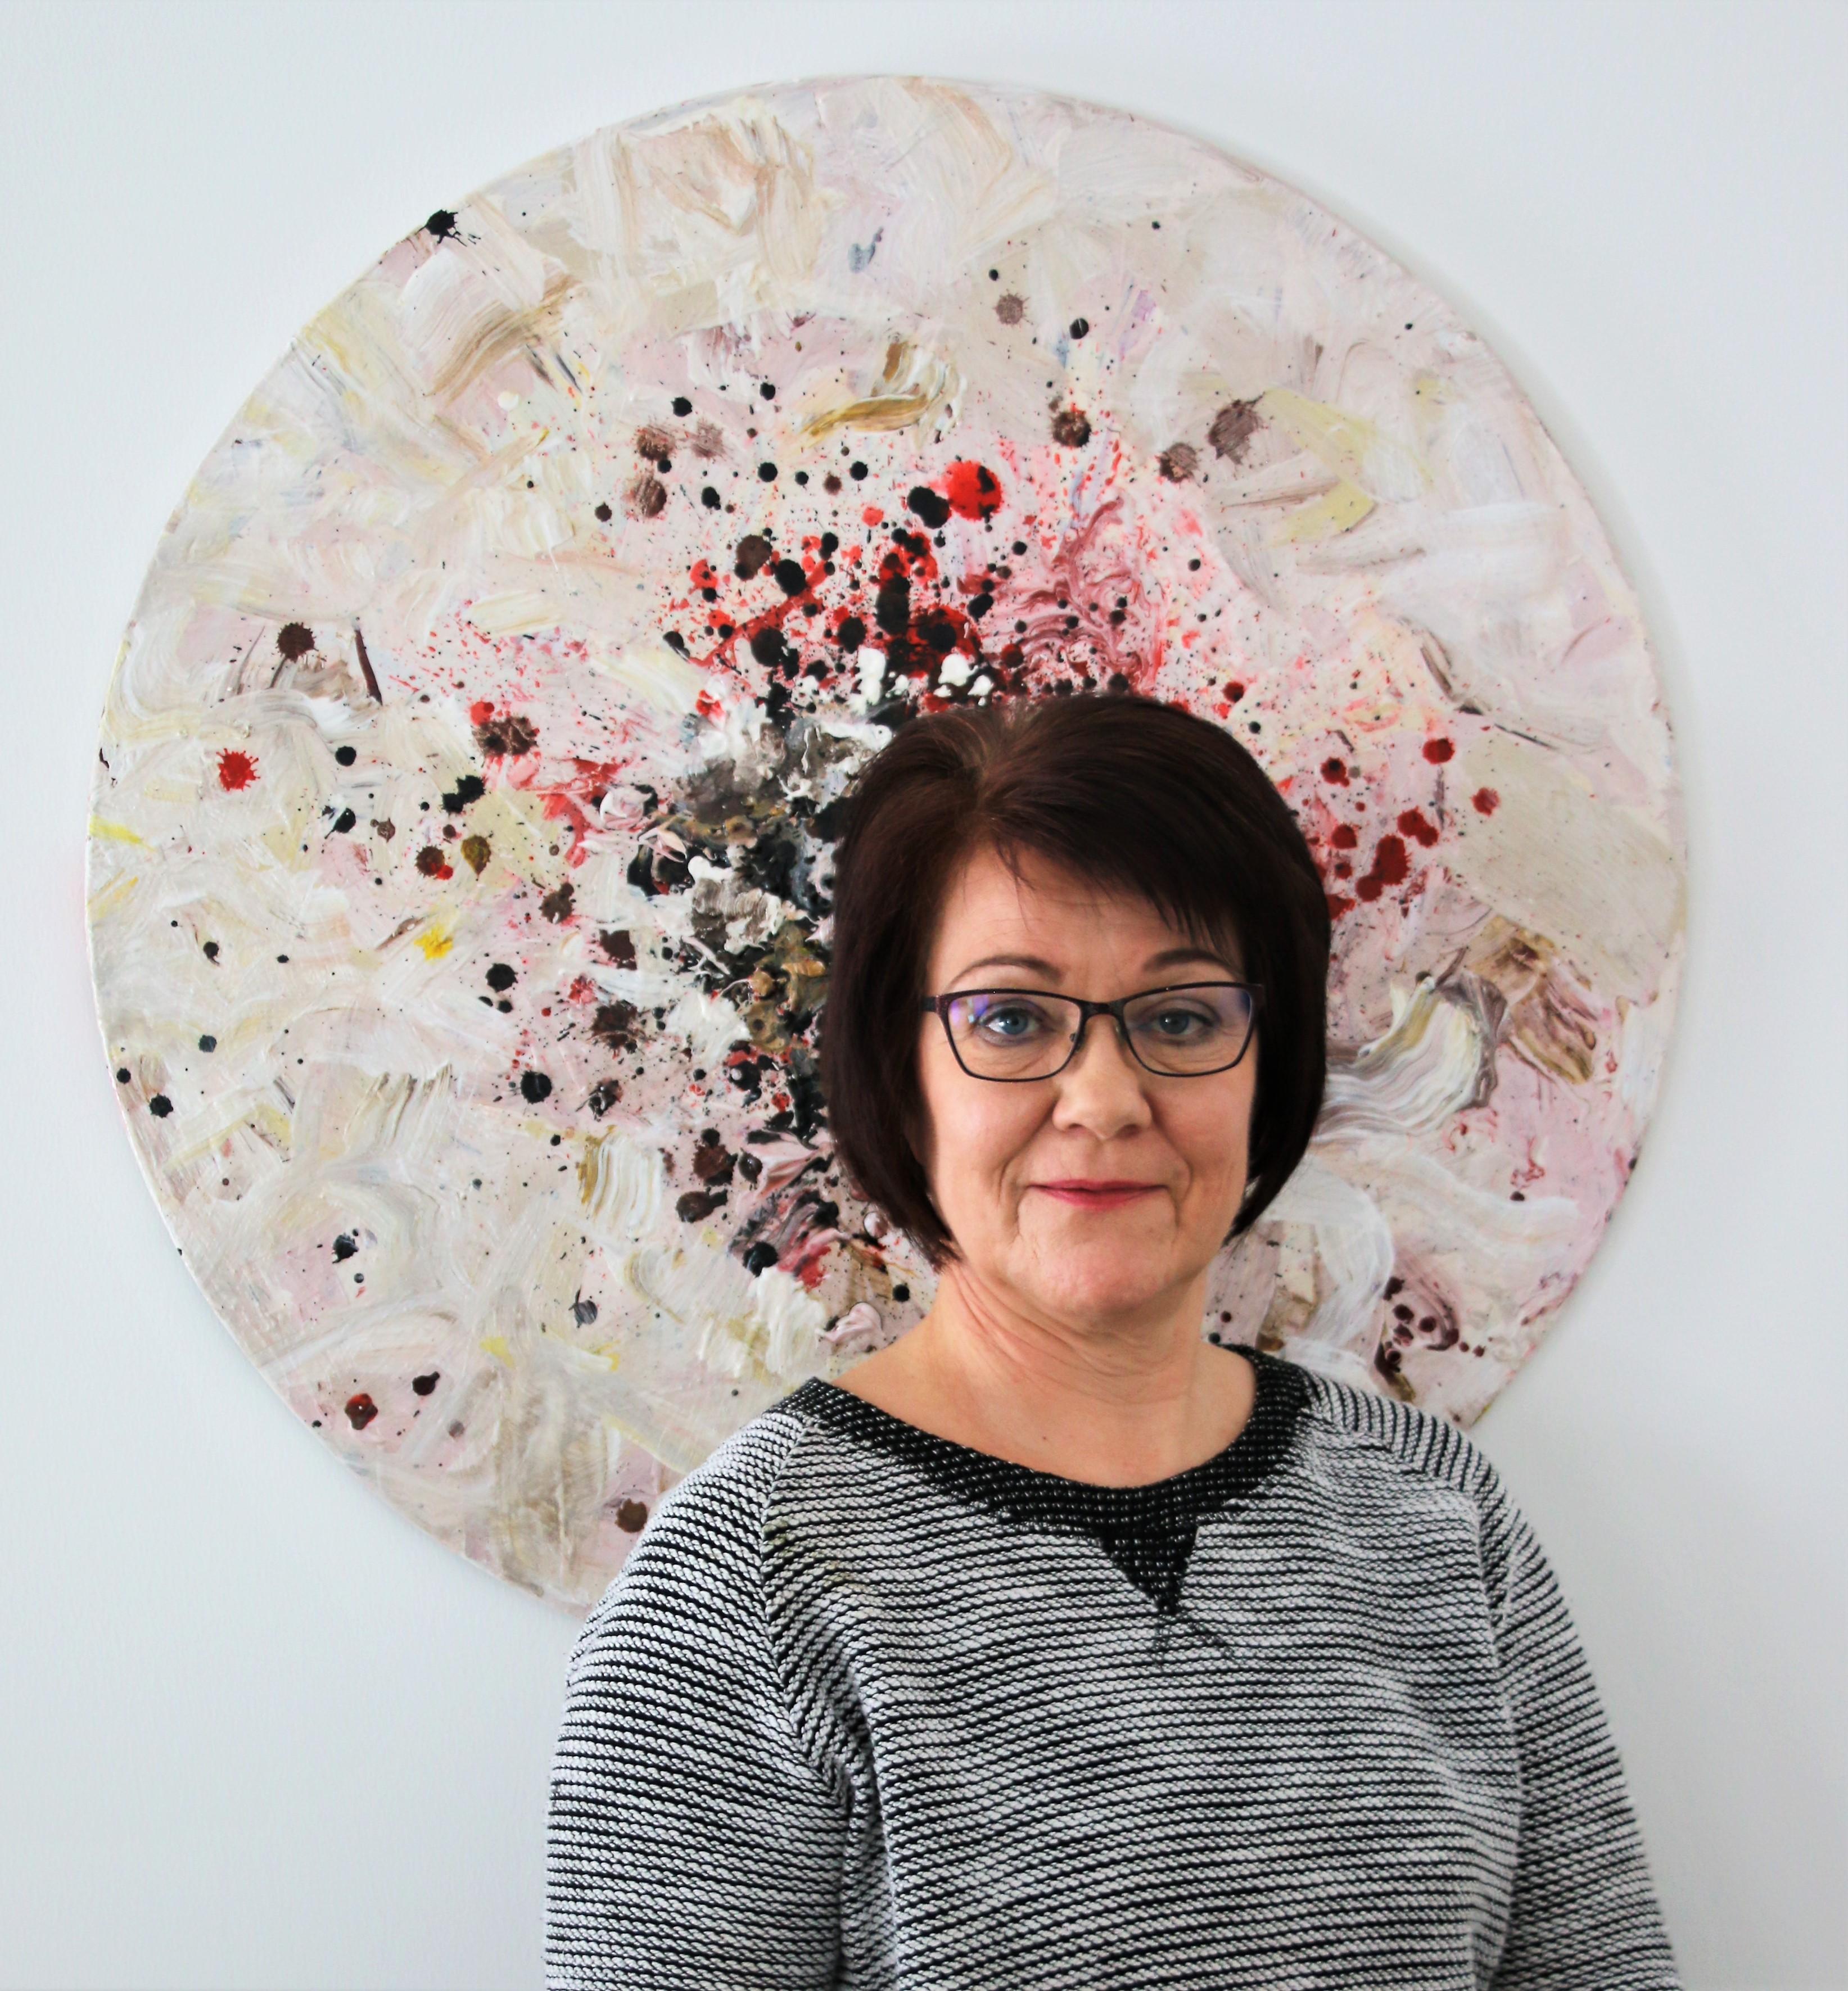 Leena Vainio